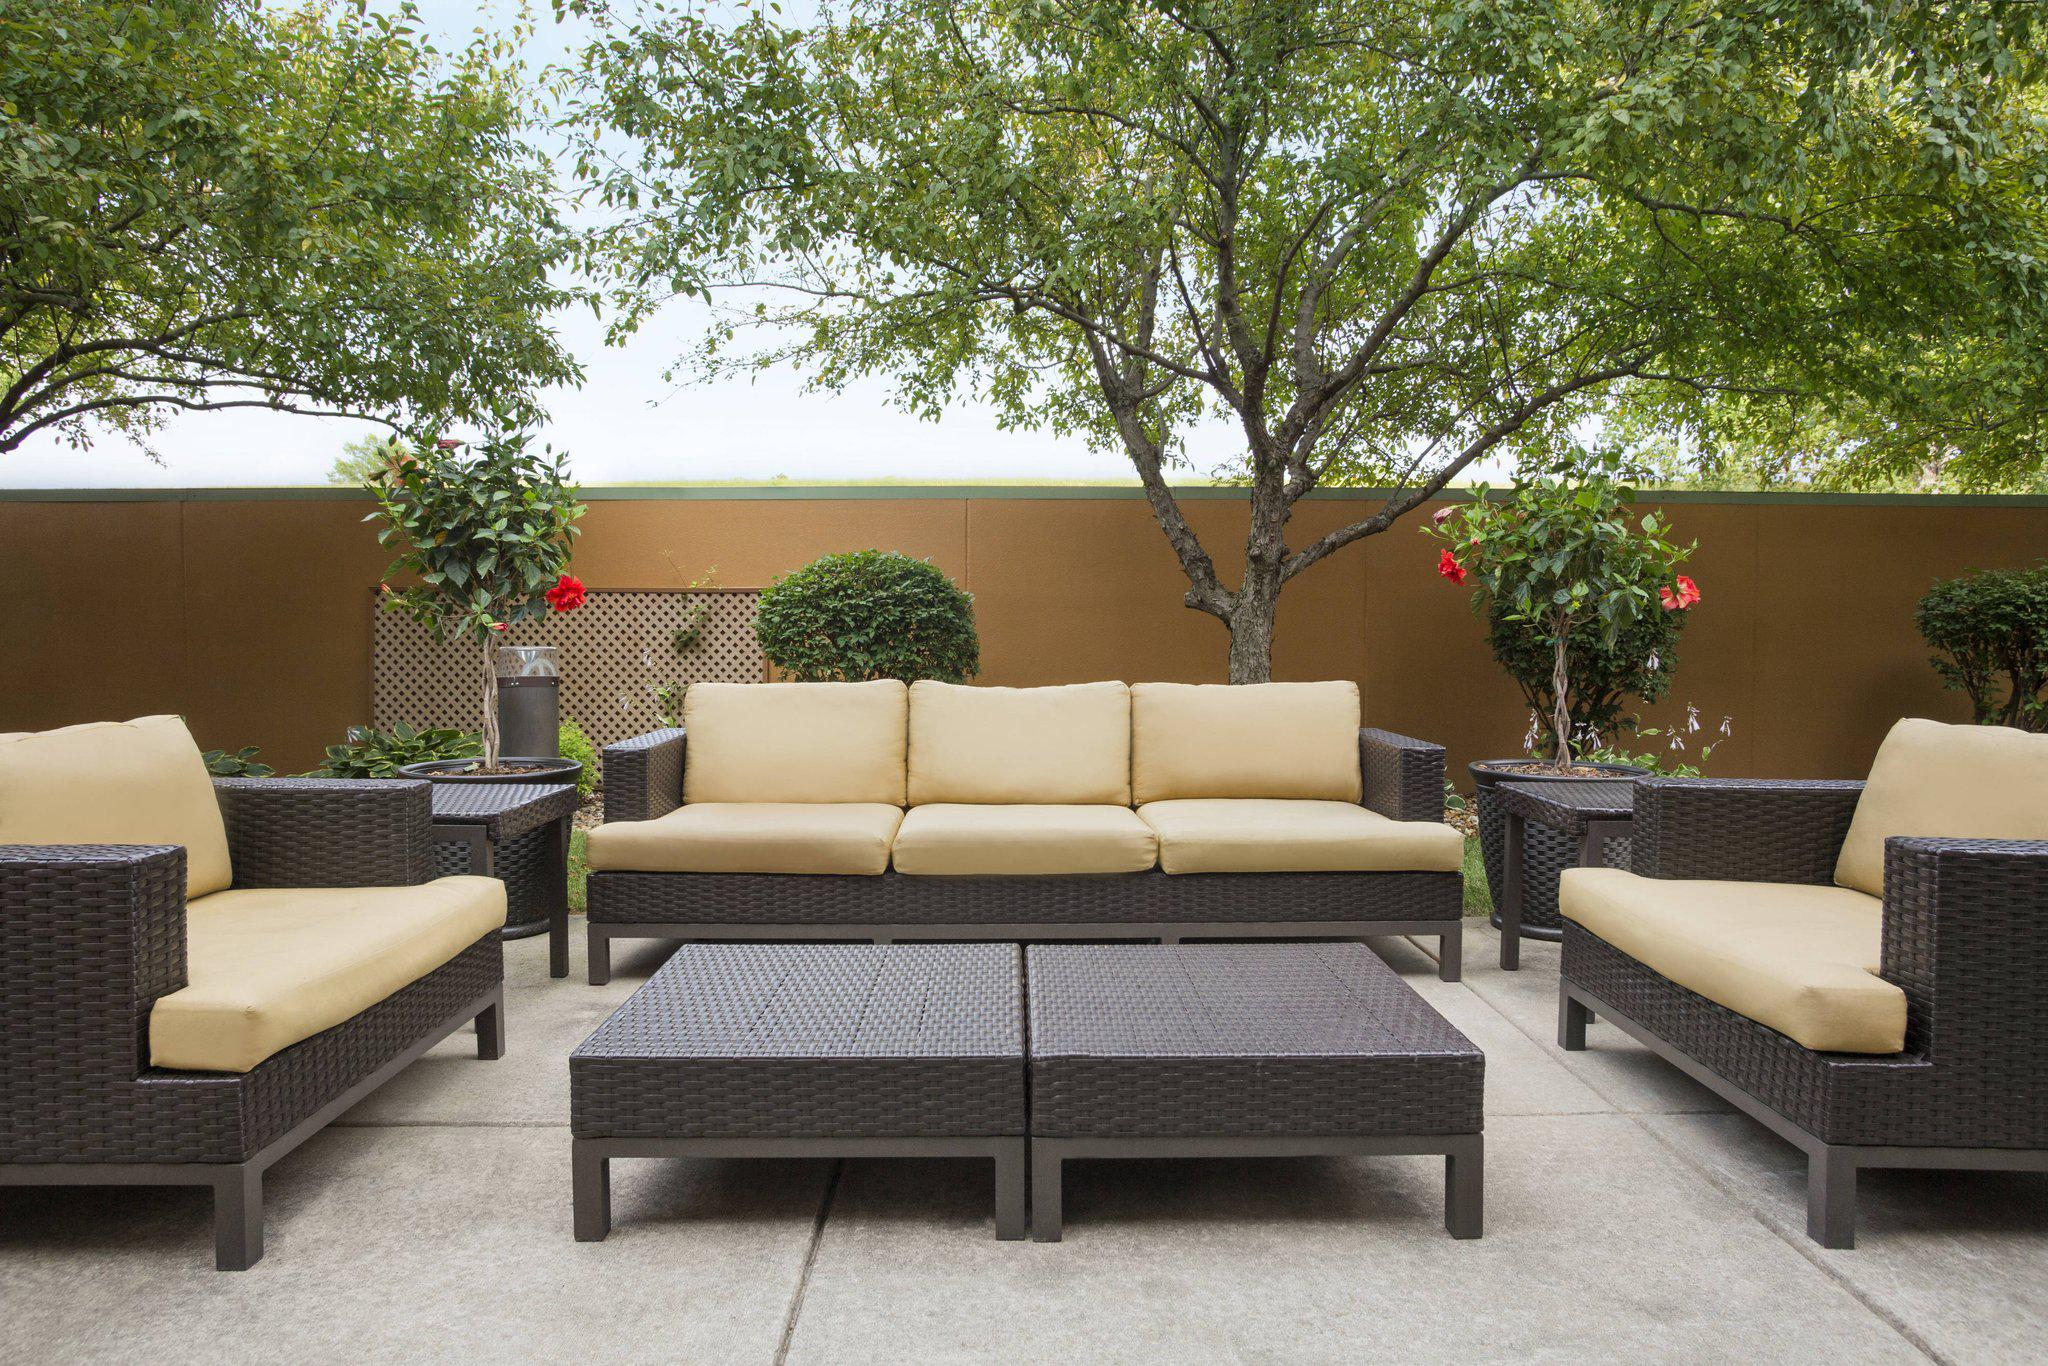 Courtyard by Marriott Springfield